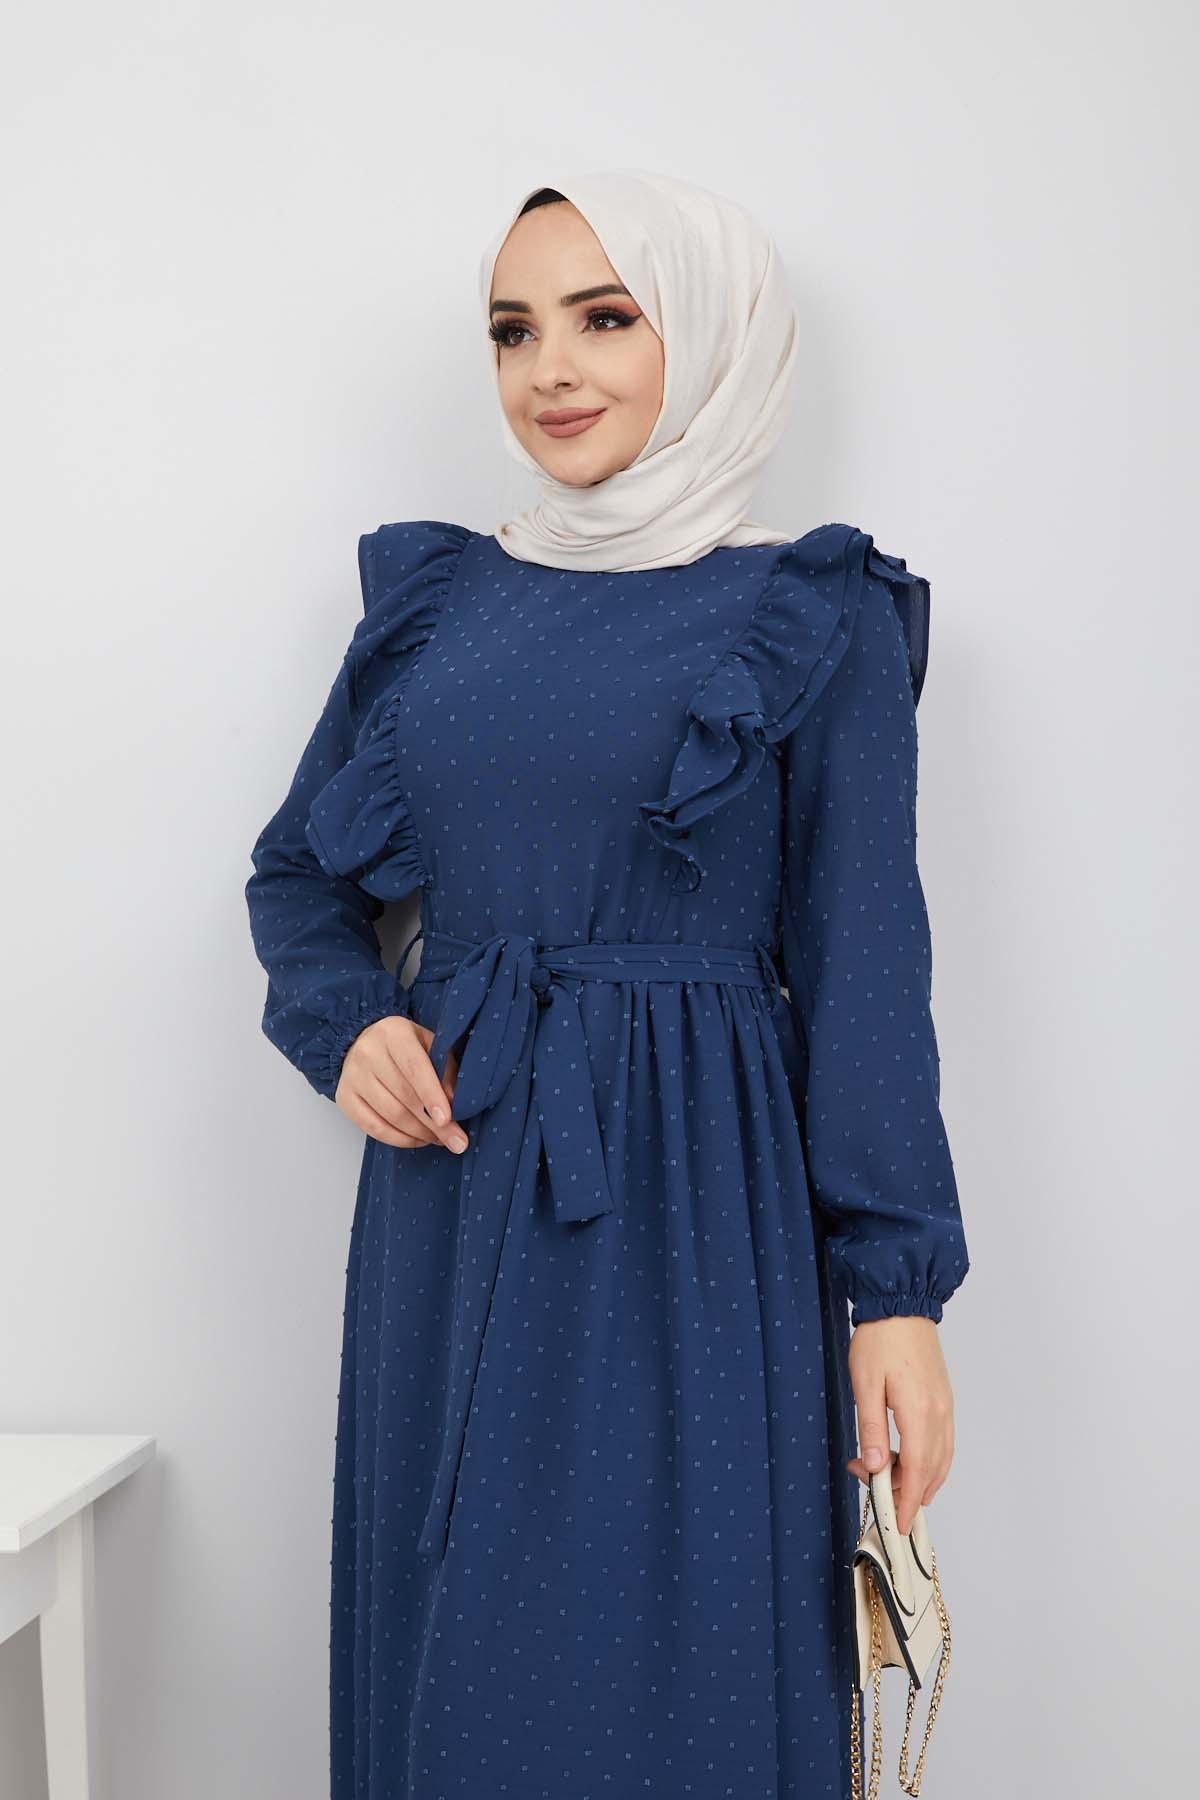 Ponpon İşlemeli Prenses Elbise - Mavi